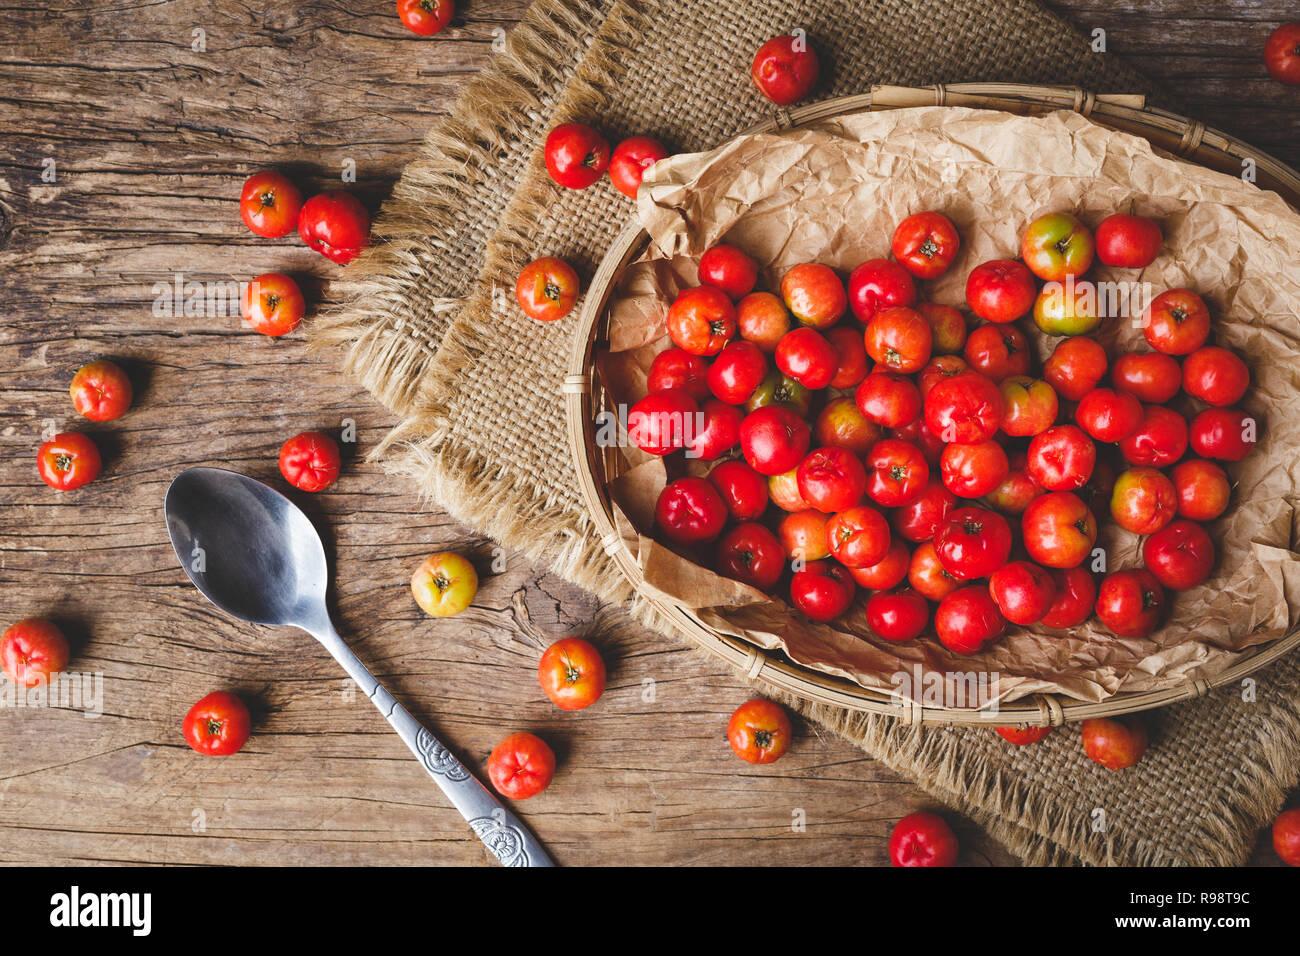 Barbados Cherry fruits - Stock Image